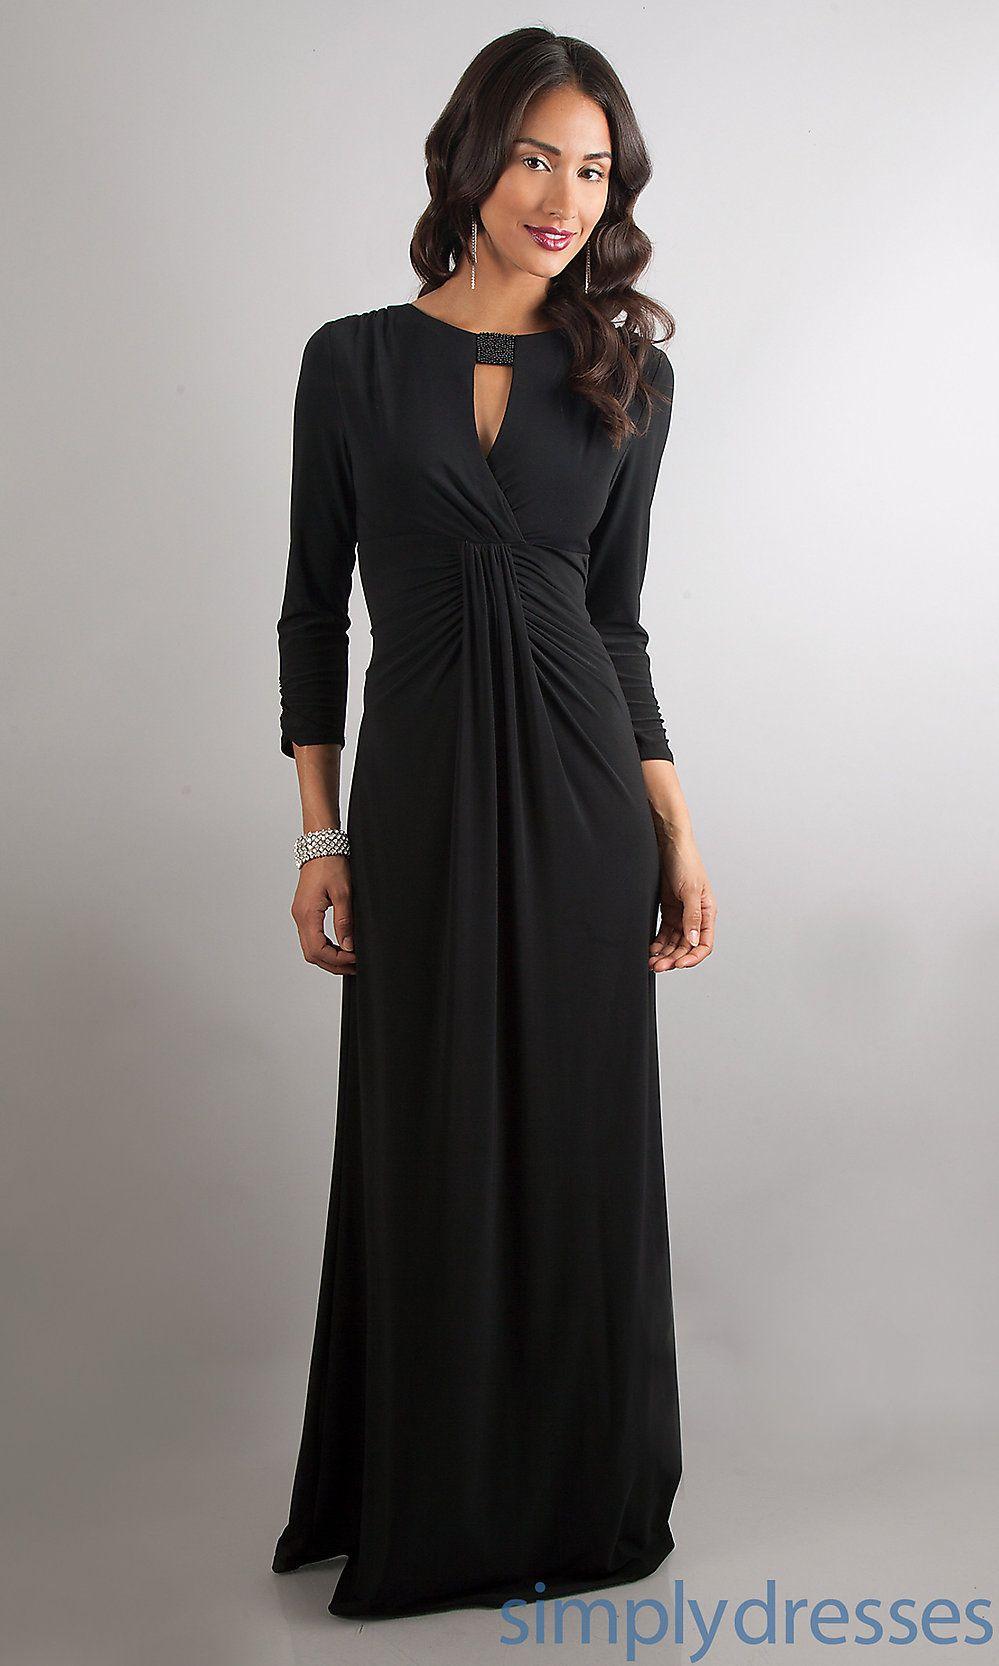 Rent designer wedding dress  View Dress Detail AX  Fabulously Formal  Pinterest